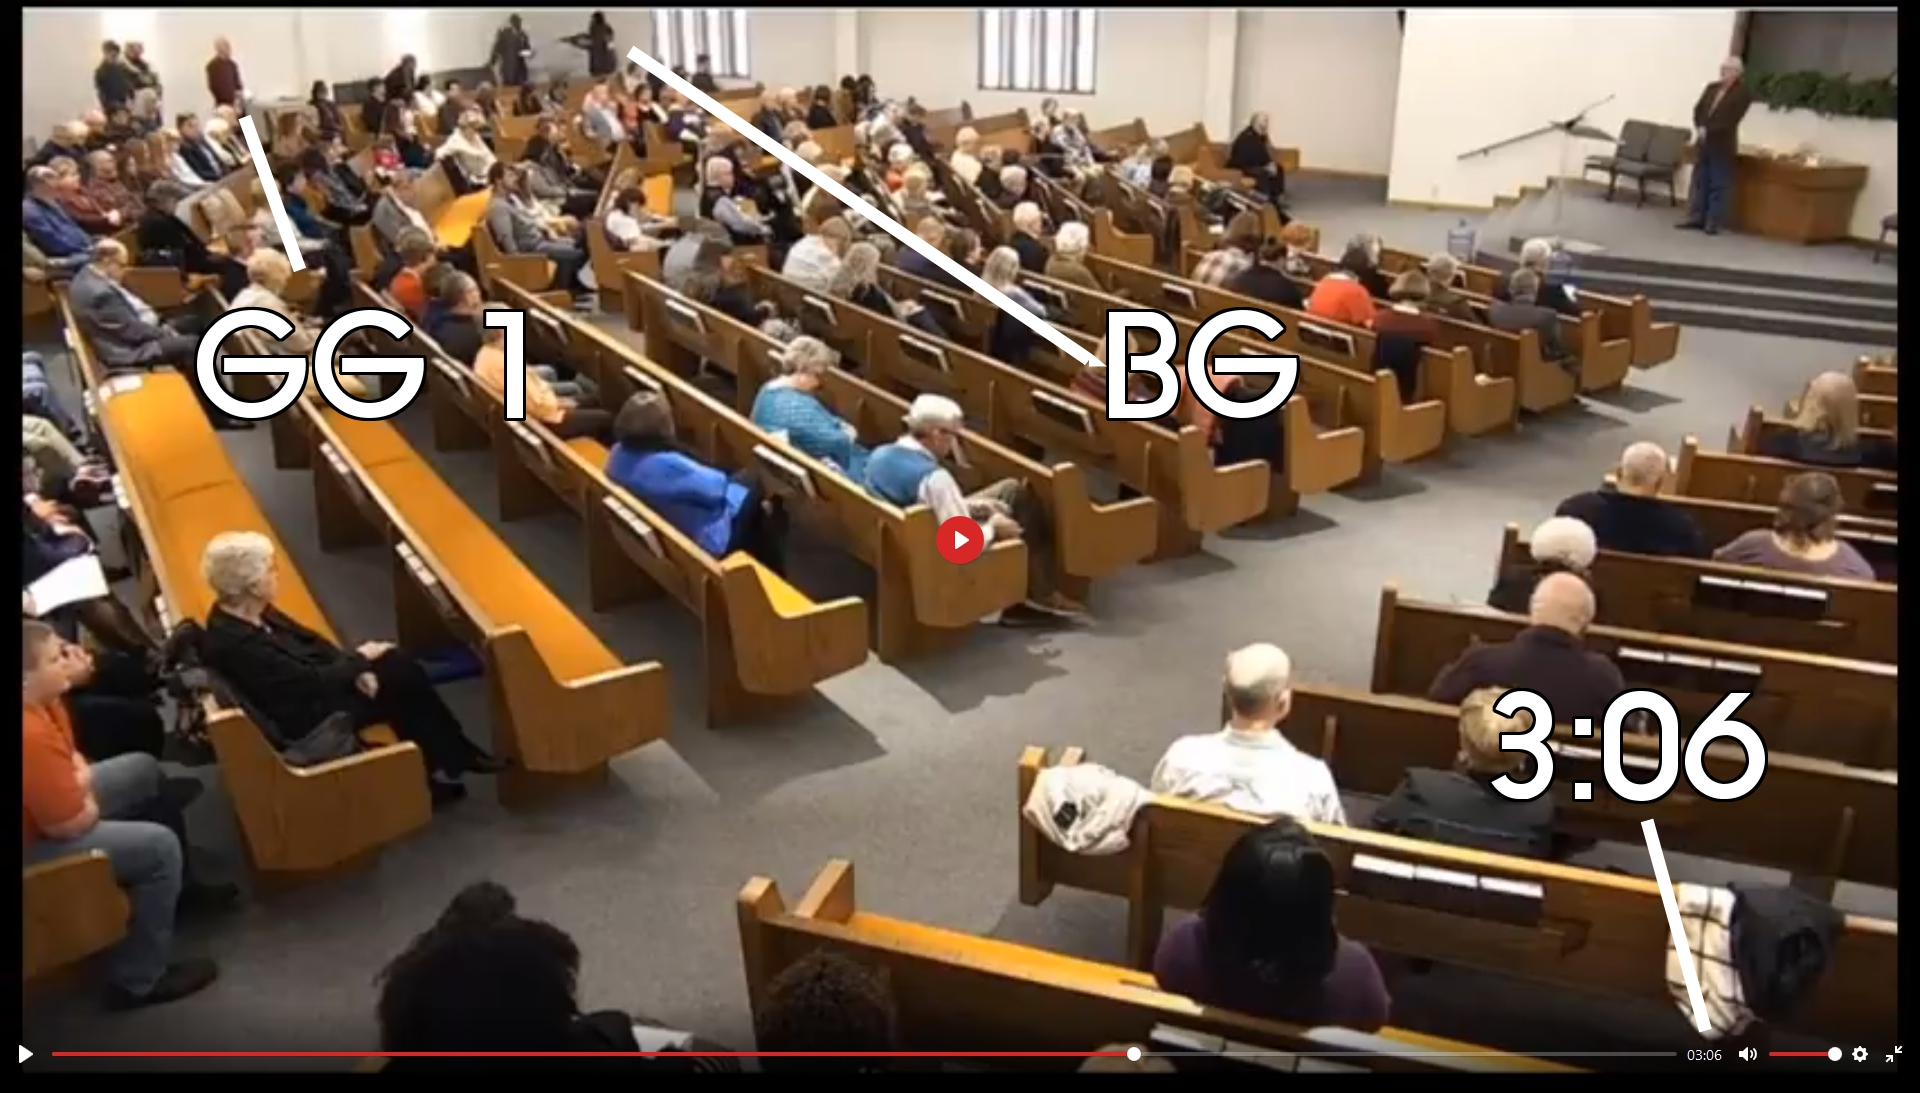 Streaming Video of the White Settlement, TX, Church Shooting-ggwag-1.jpg